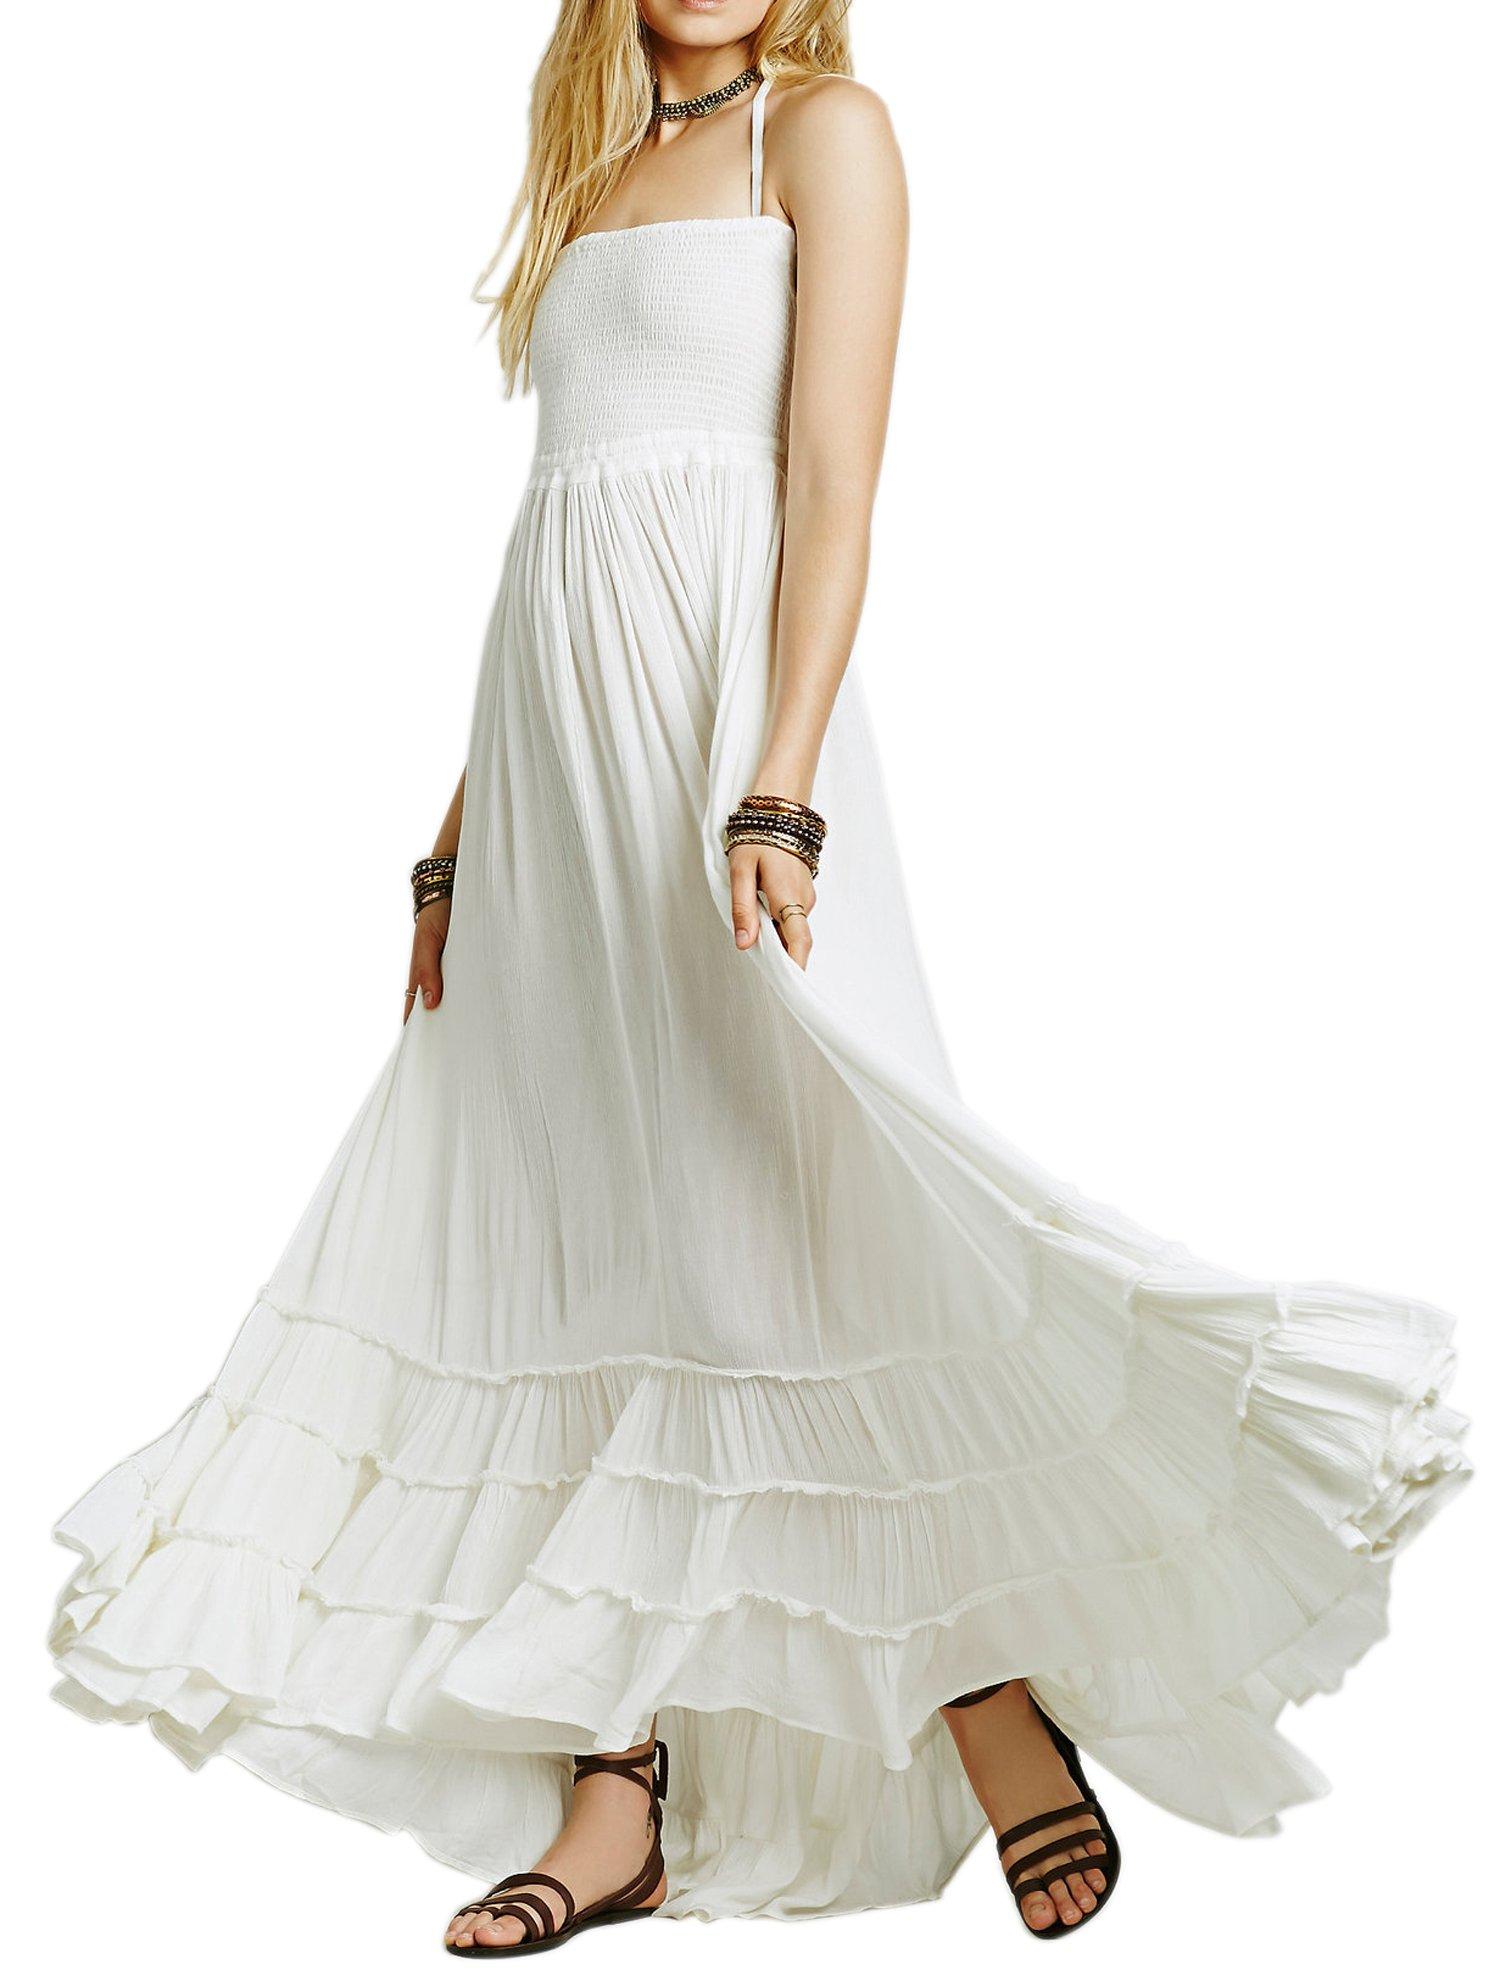 R.Vivimos Women Summer Cotton Sexy Blackless Long Dresses Small White